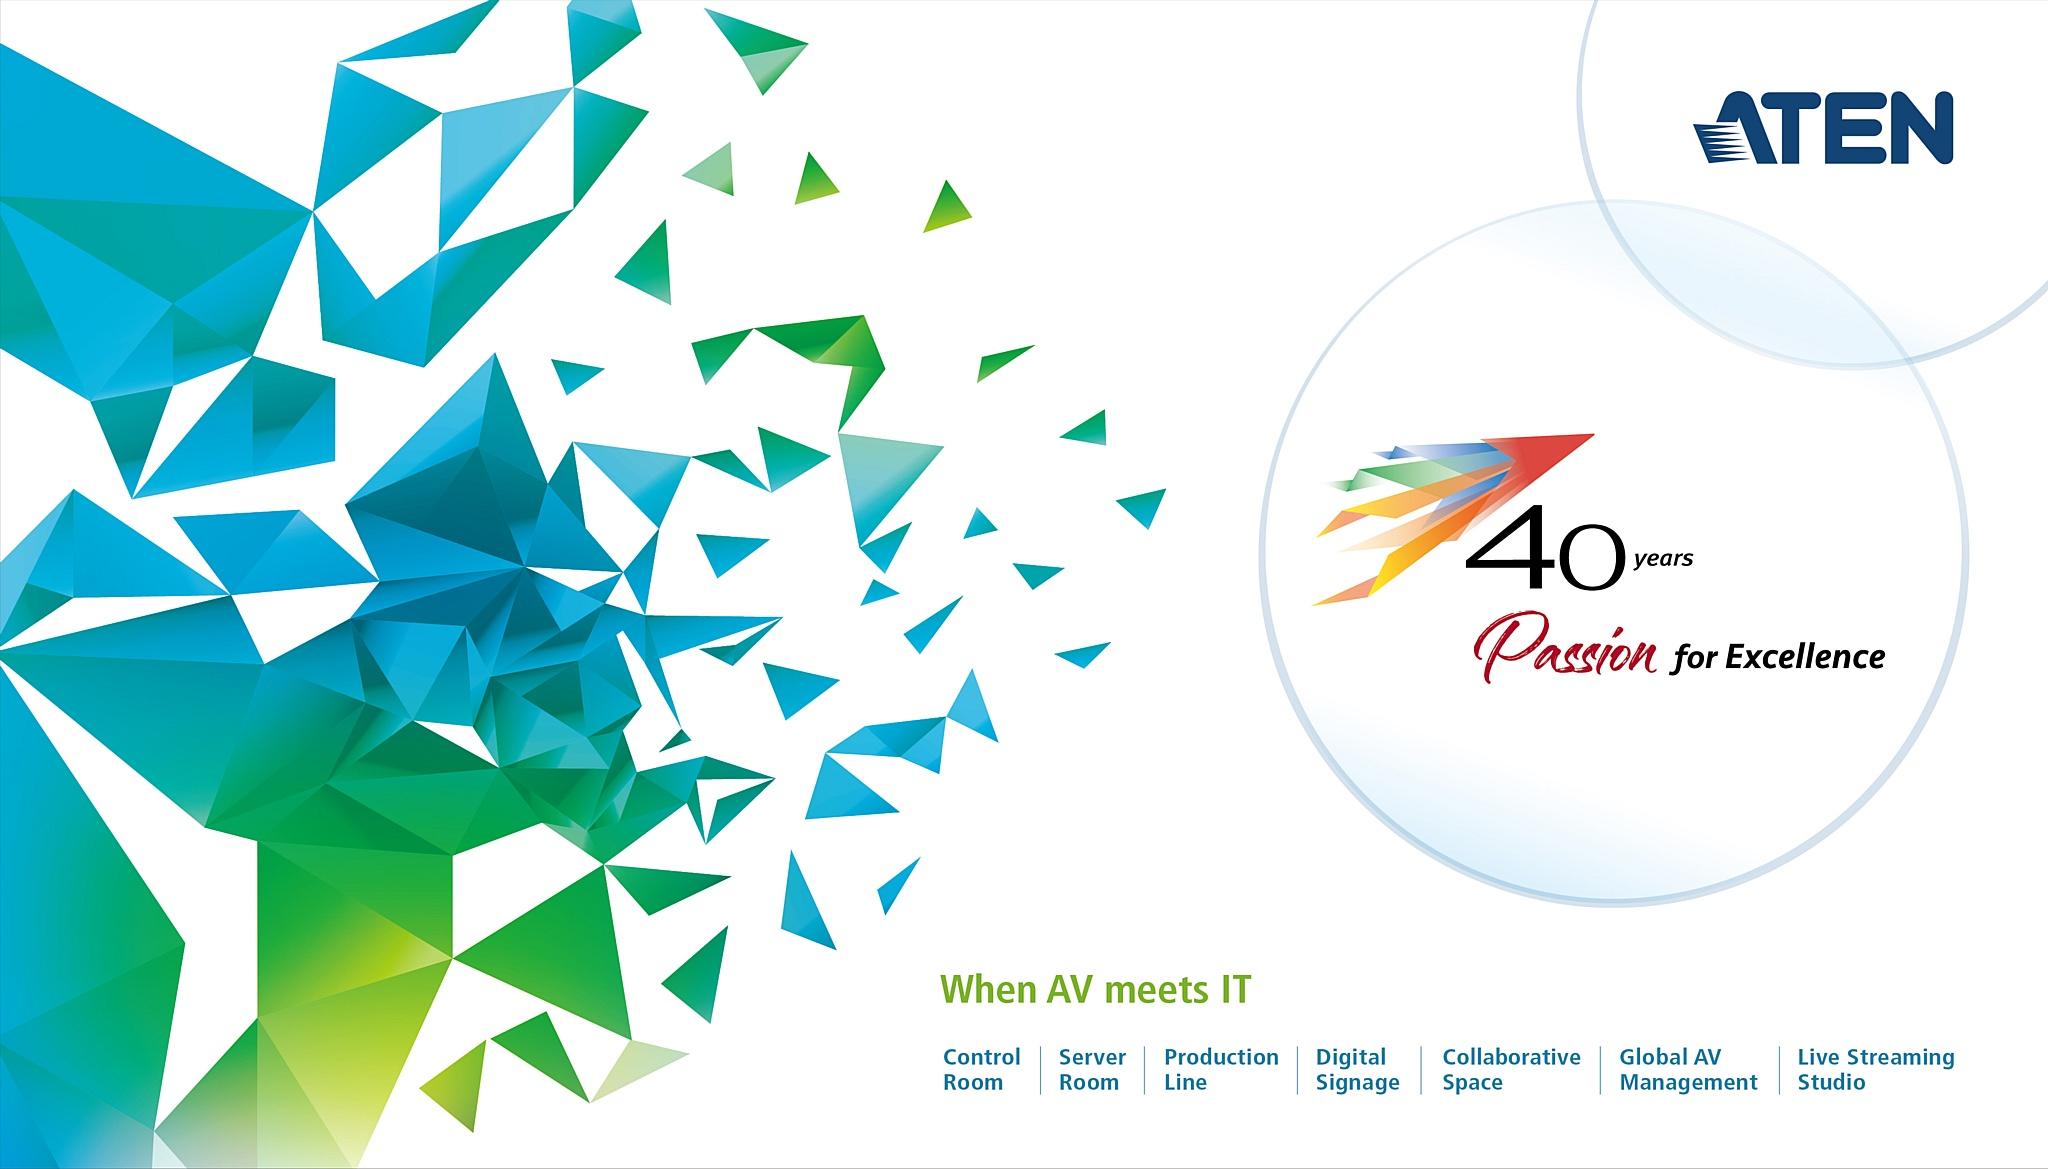 Aten отмечает 40-летний юбилей достижений в AV & IT на Computex 2019